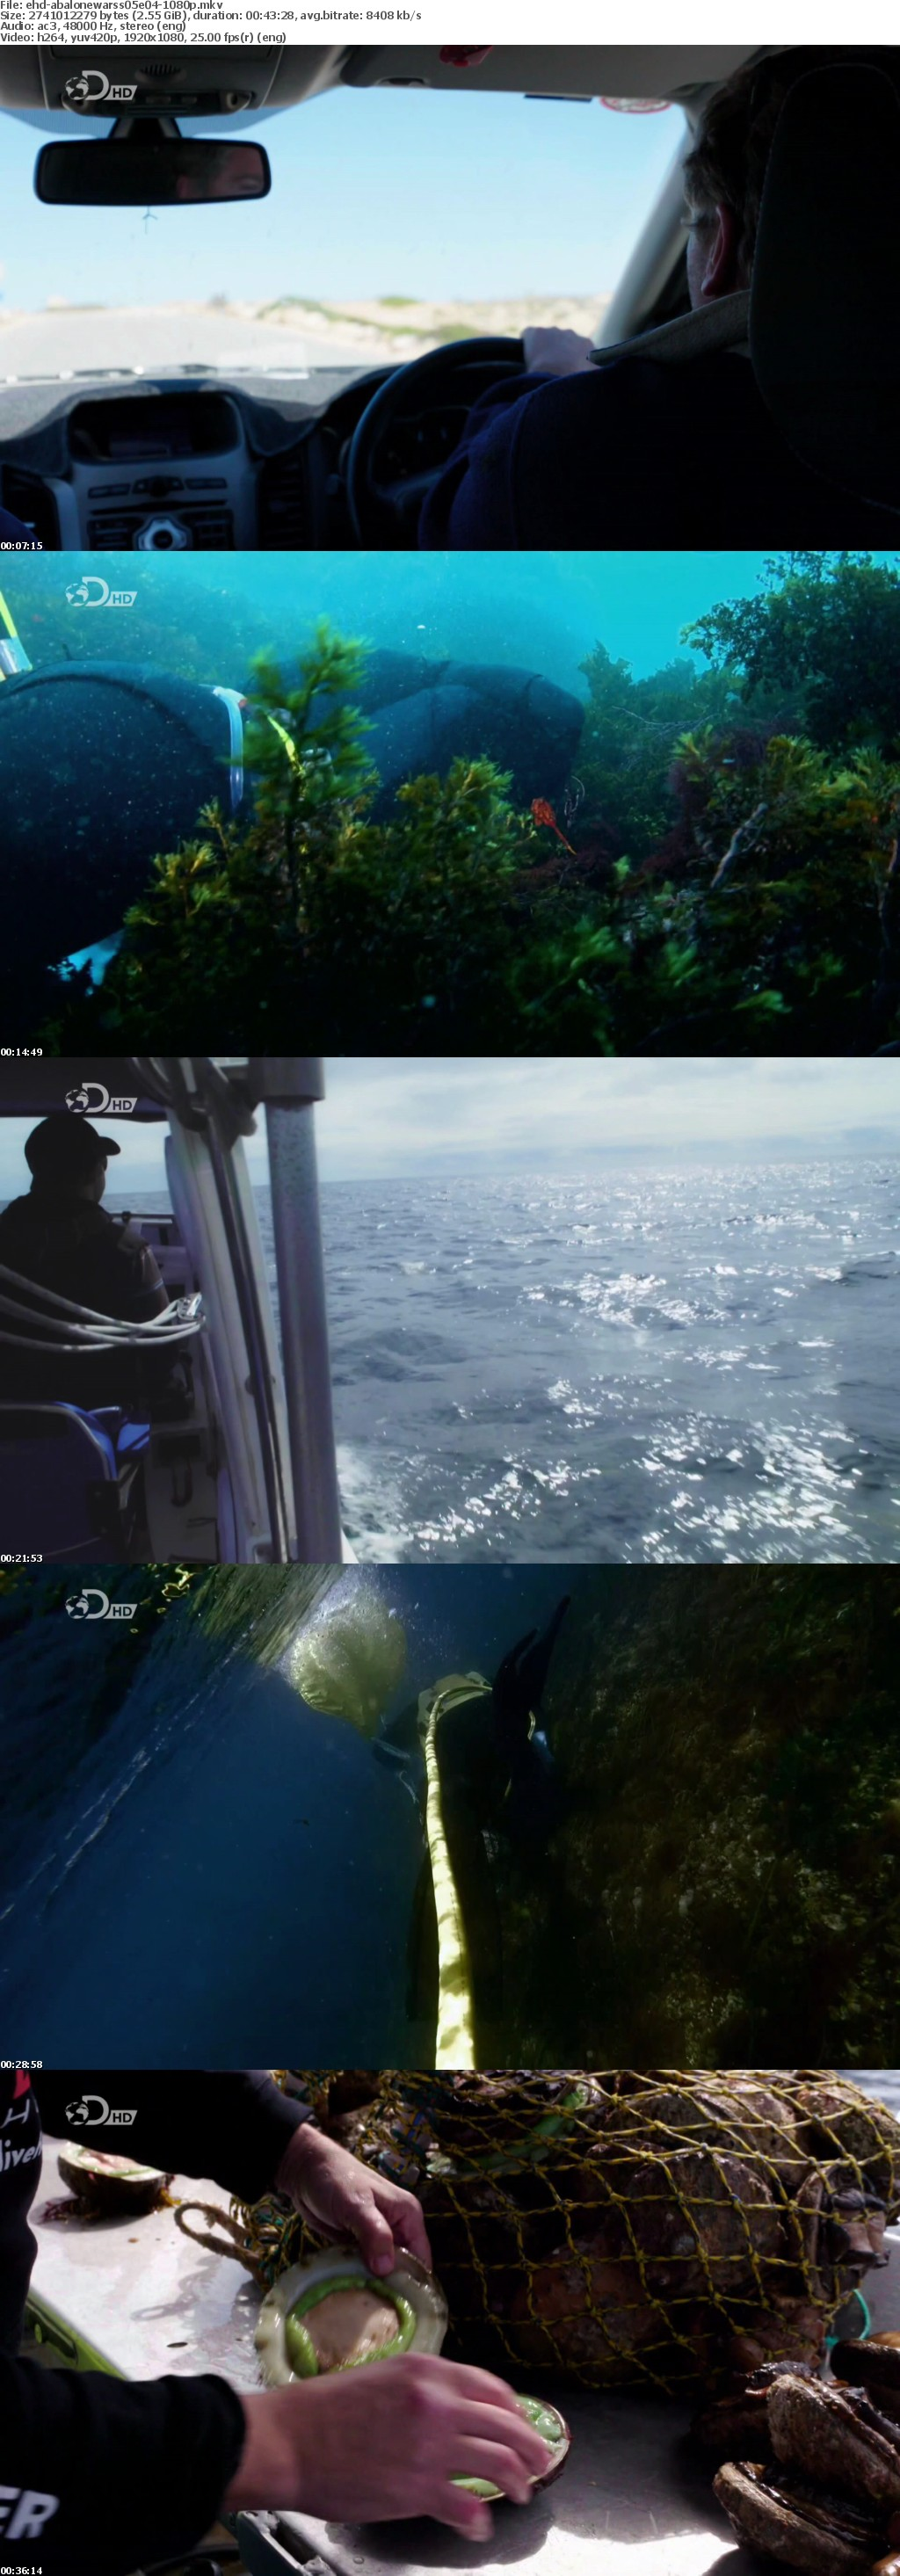 Abalone Wars S05E04 1080p HDTV x264-EHD